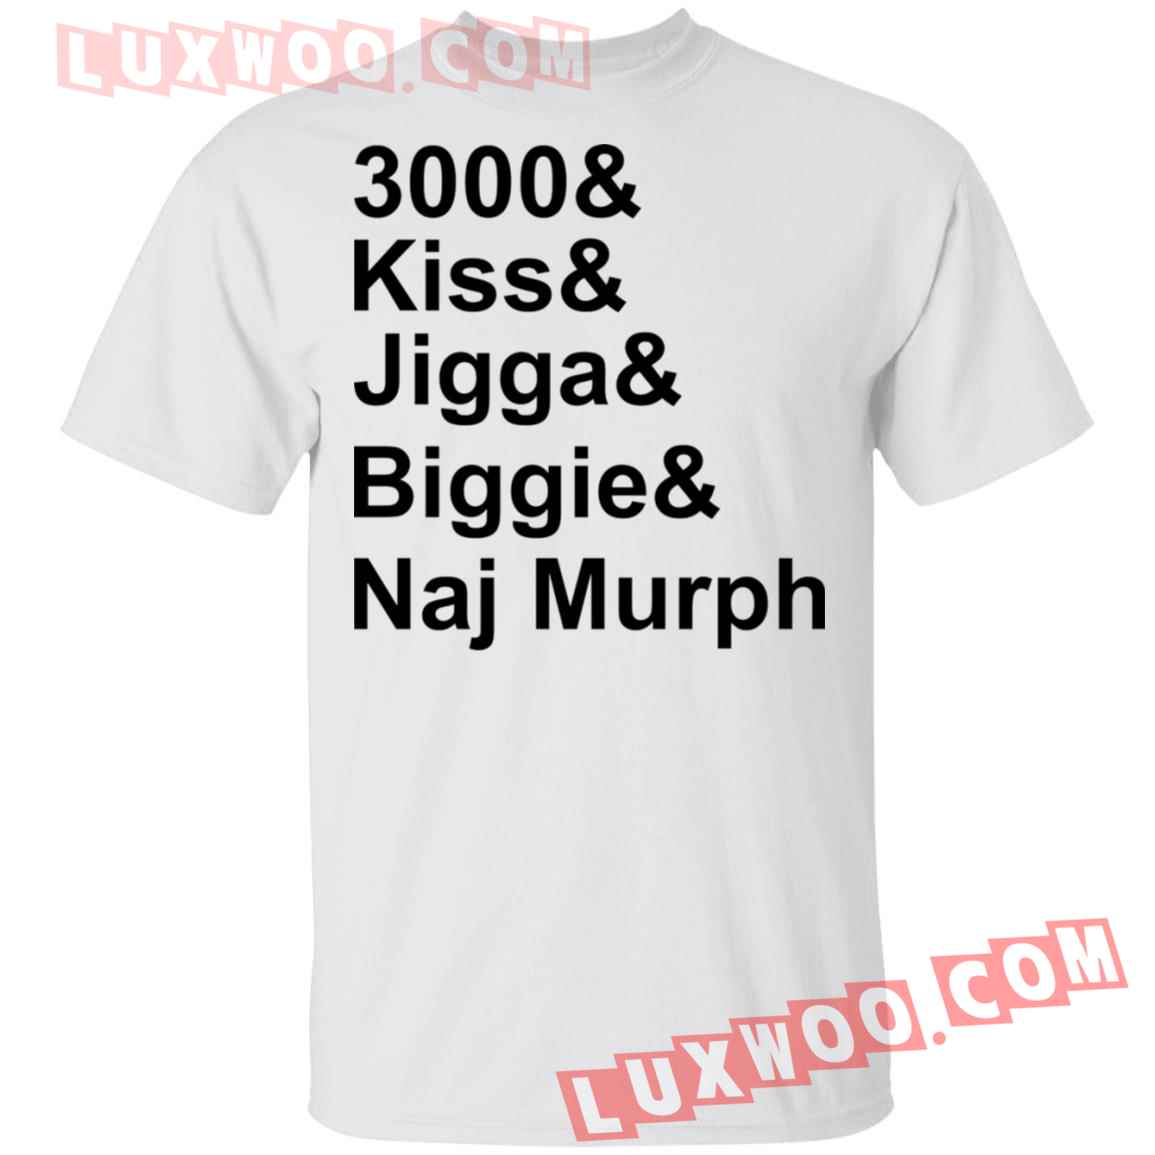 3000 Kiss Jigga Biggie Naj Murph Shirt